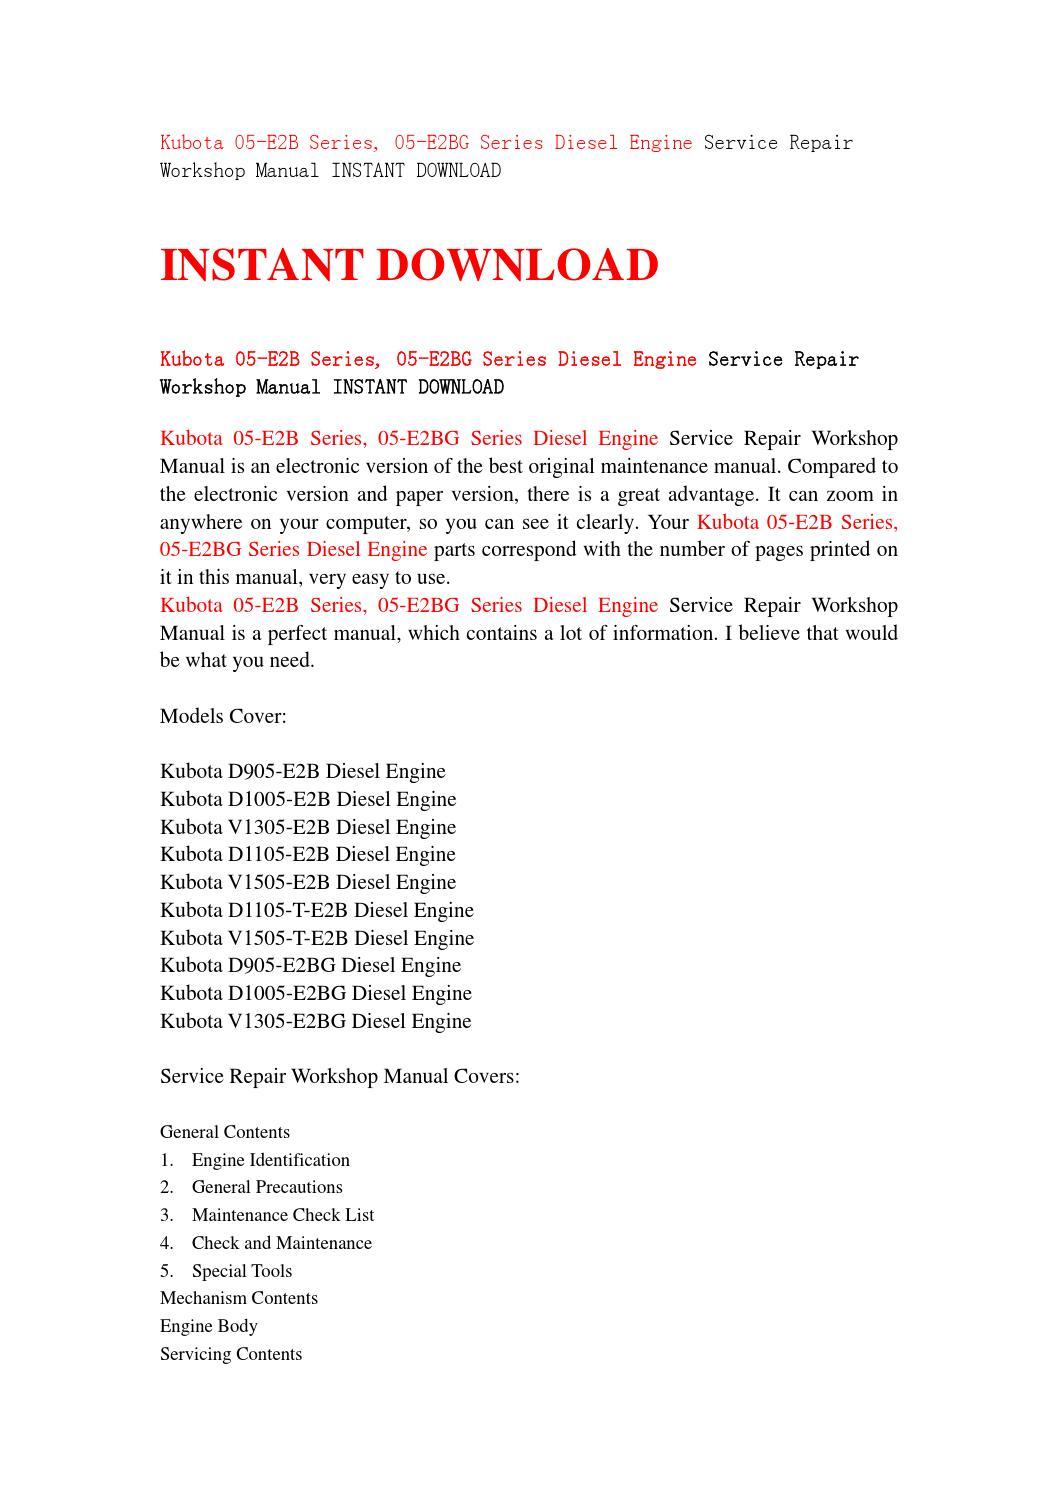 Kubota 05 e2b series, 05 e2bg series diesel engine service repair workshop  manual instant download by jshnefse - issuu